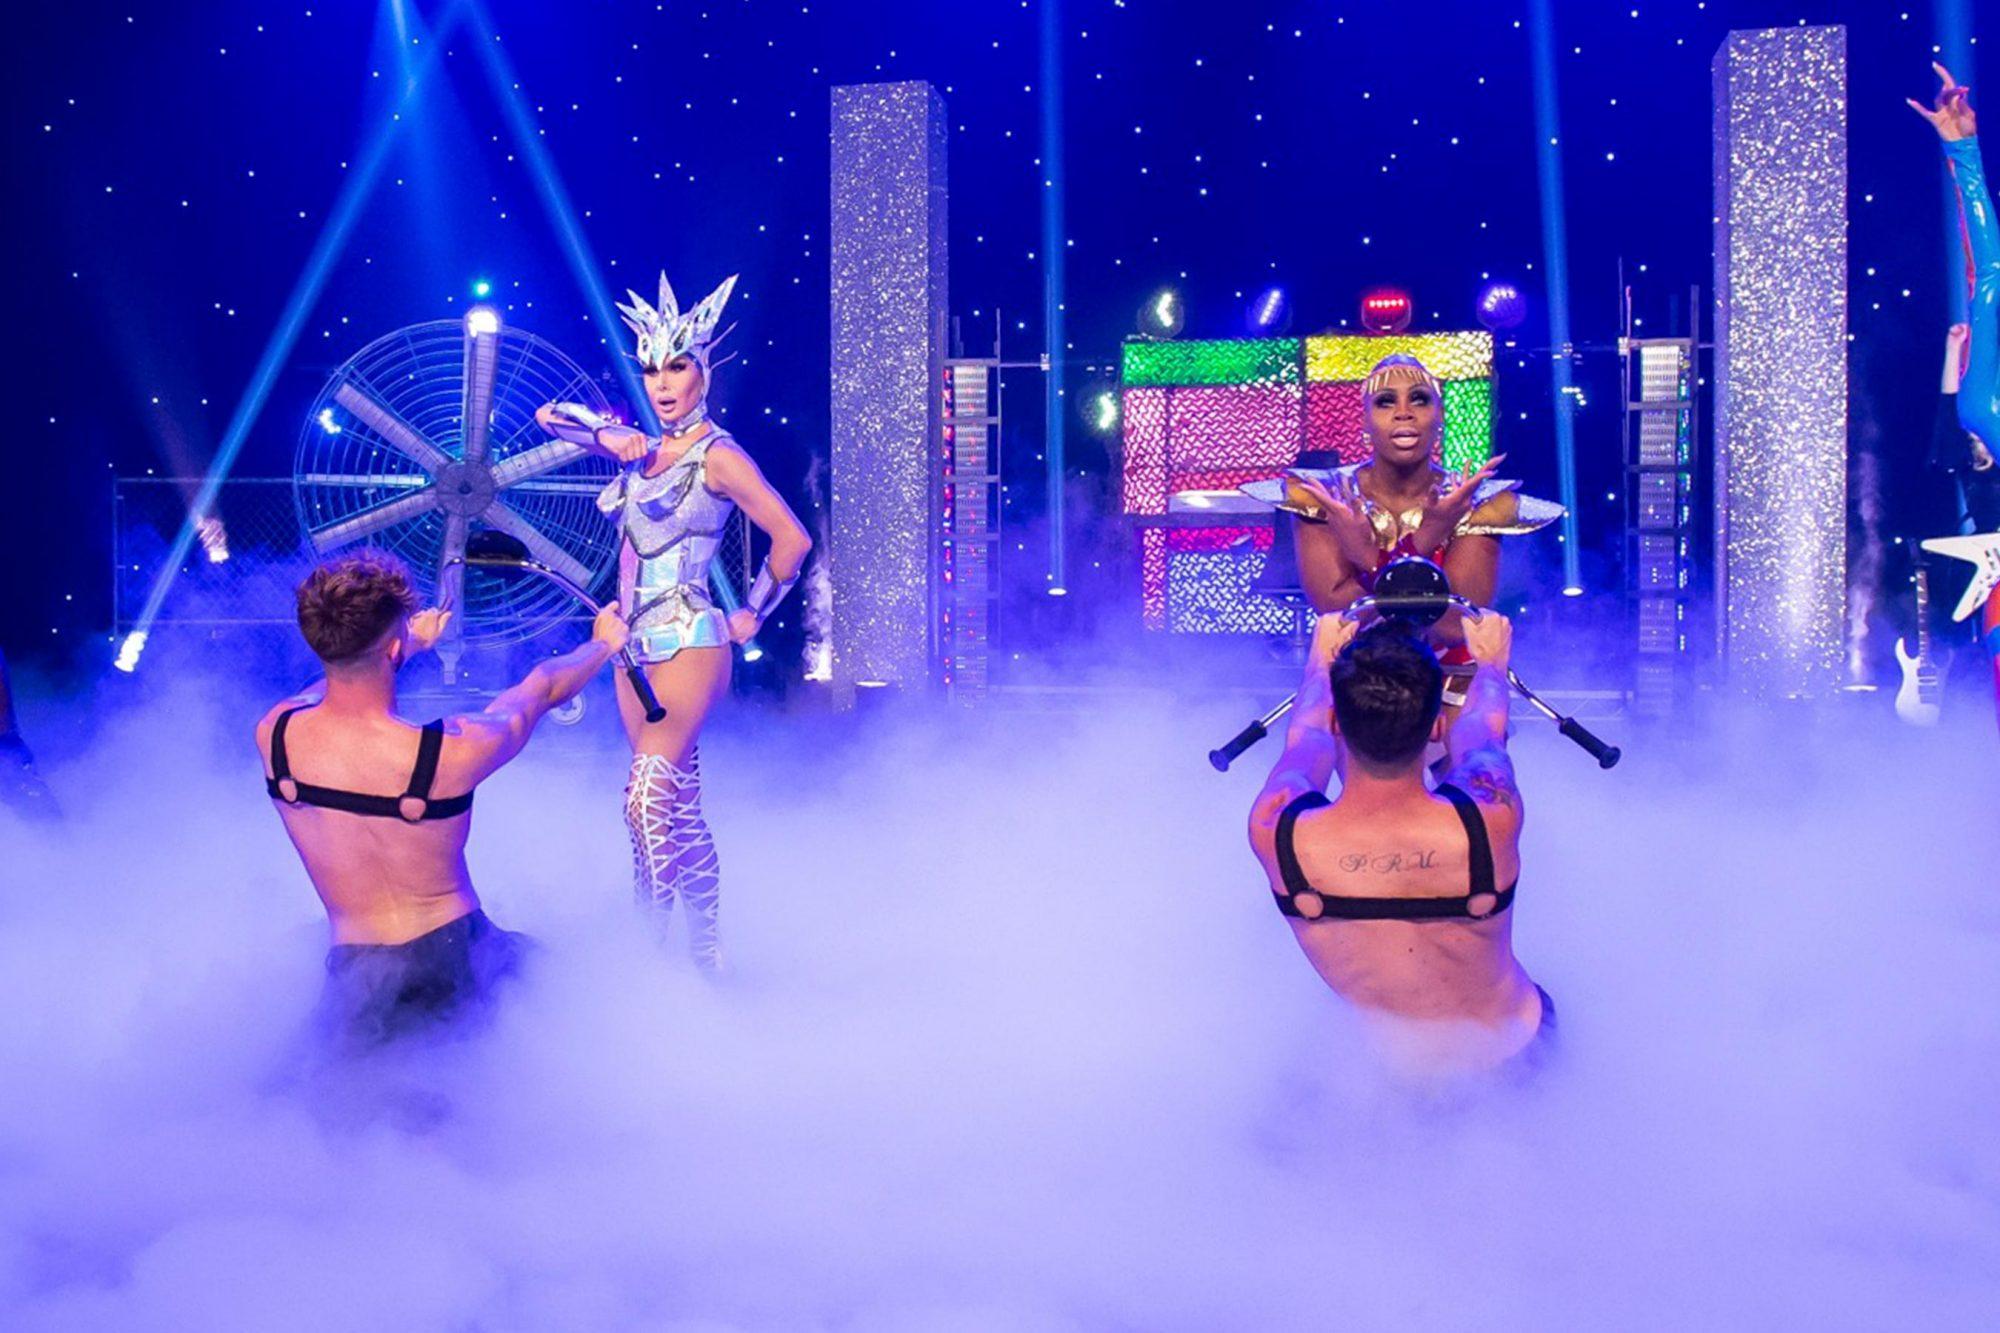 RuPaul's Drag Race finaleCR: VH1